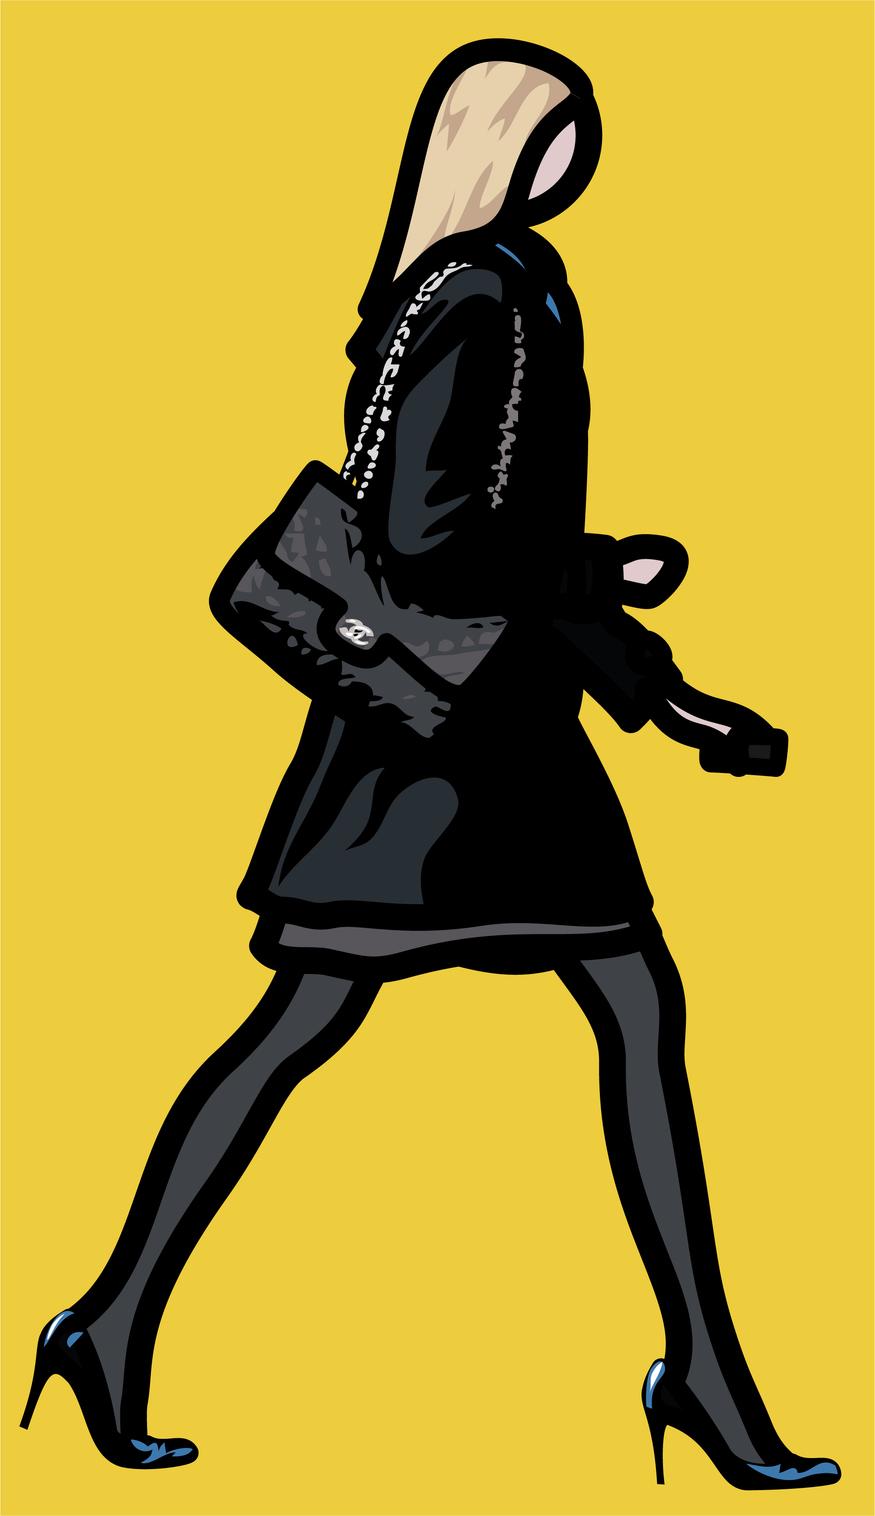 Julian Opie Woman in high heels with telephone. © Julian Opie and Lisson Gallery